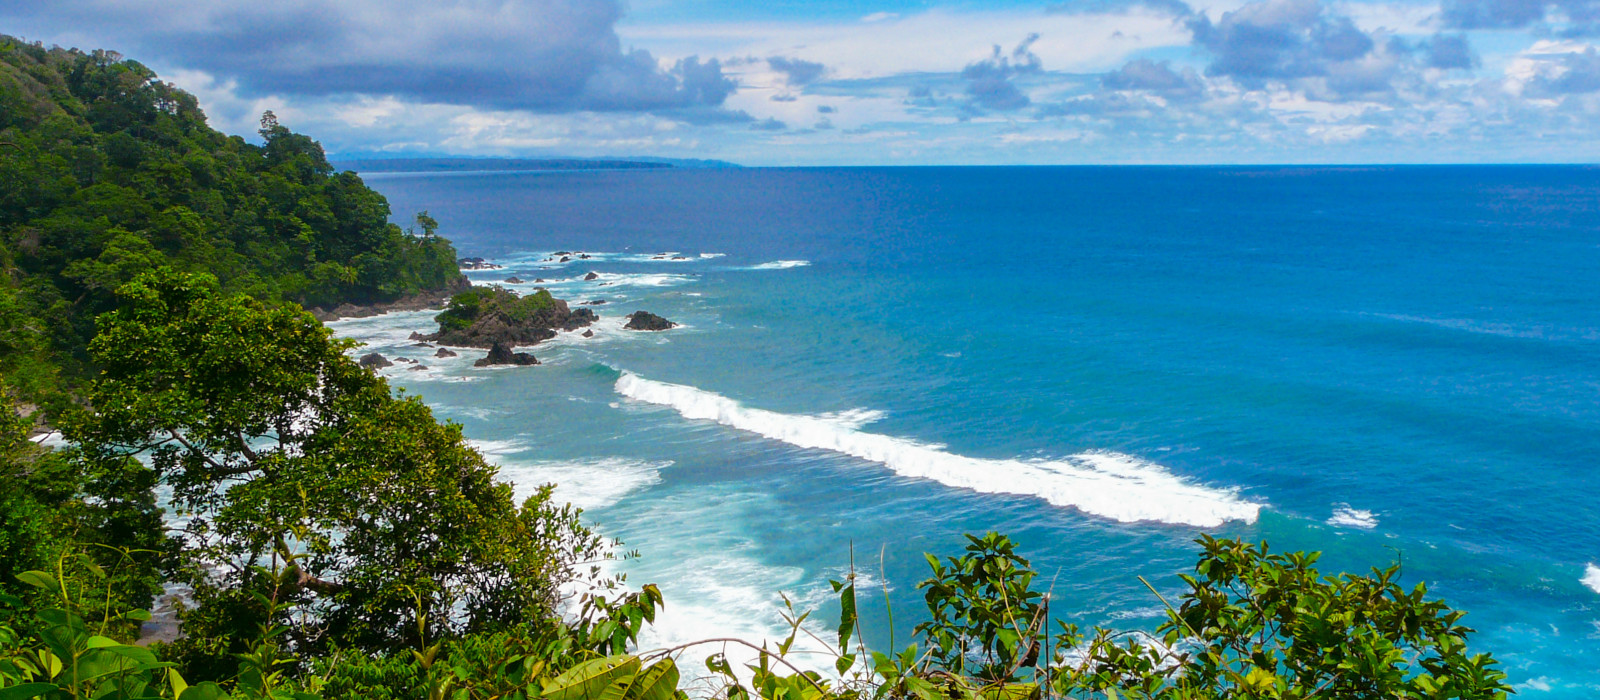 Destination Osa Peninsula Costa Rica